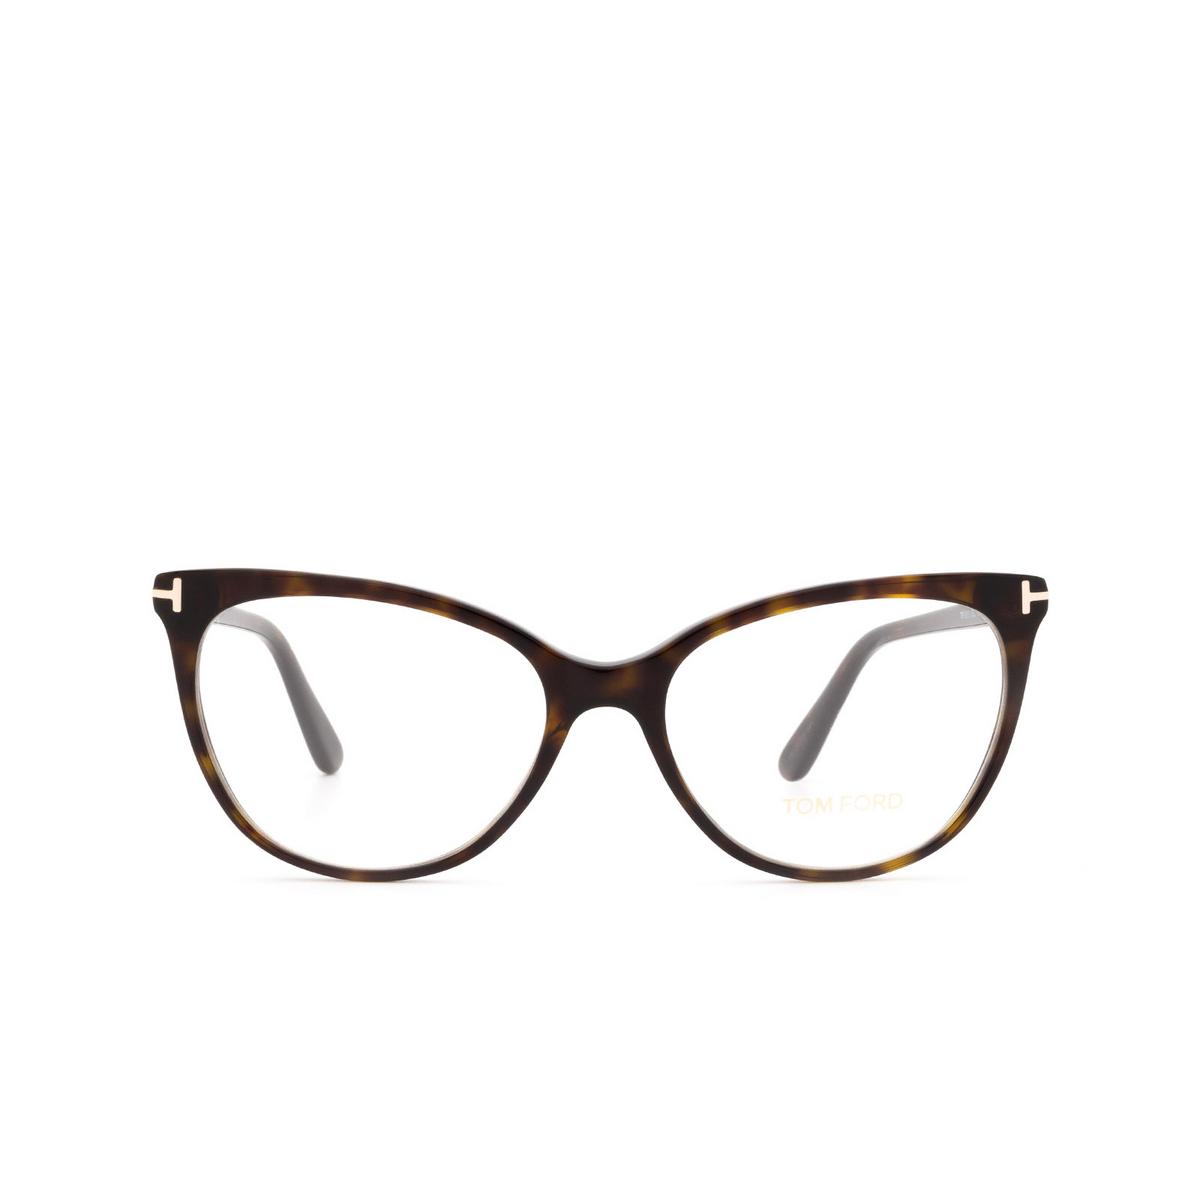 Tom Ford® Cat-eye Eyeglasses: FT5513 color Dark Havana 052 - front view.